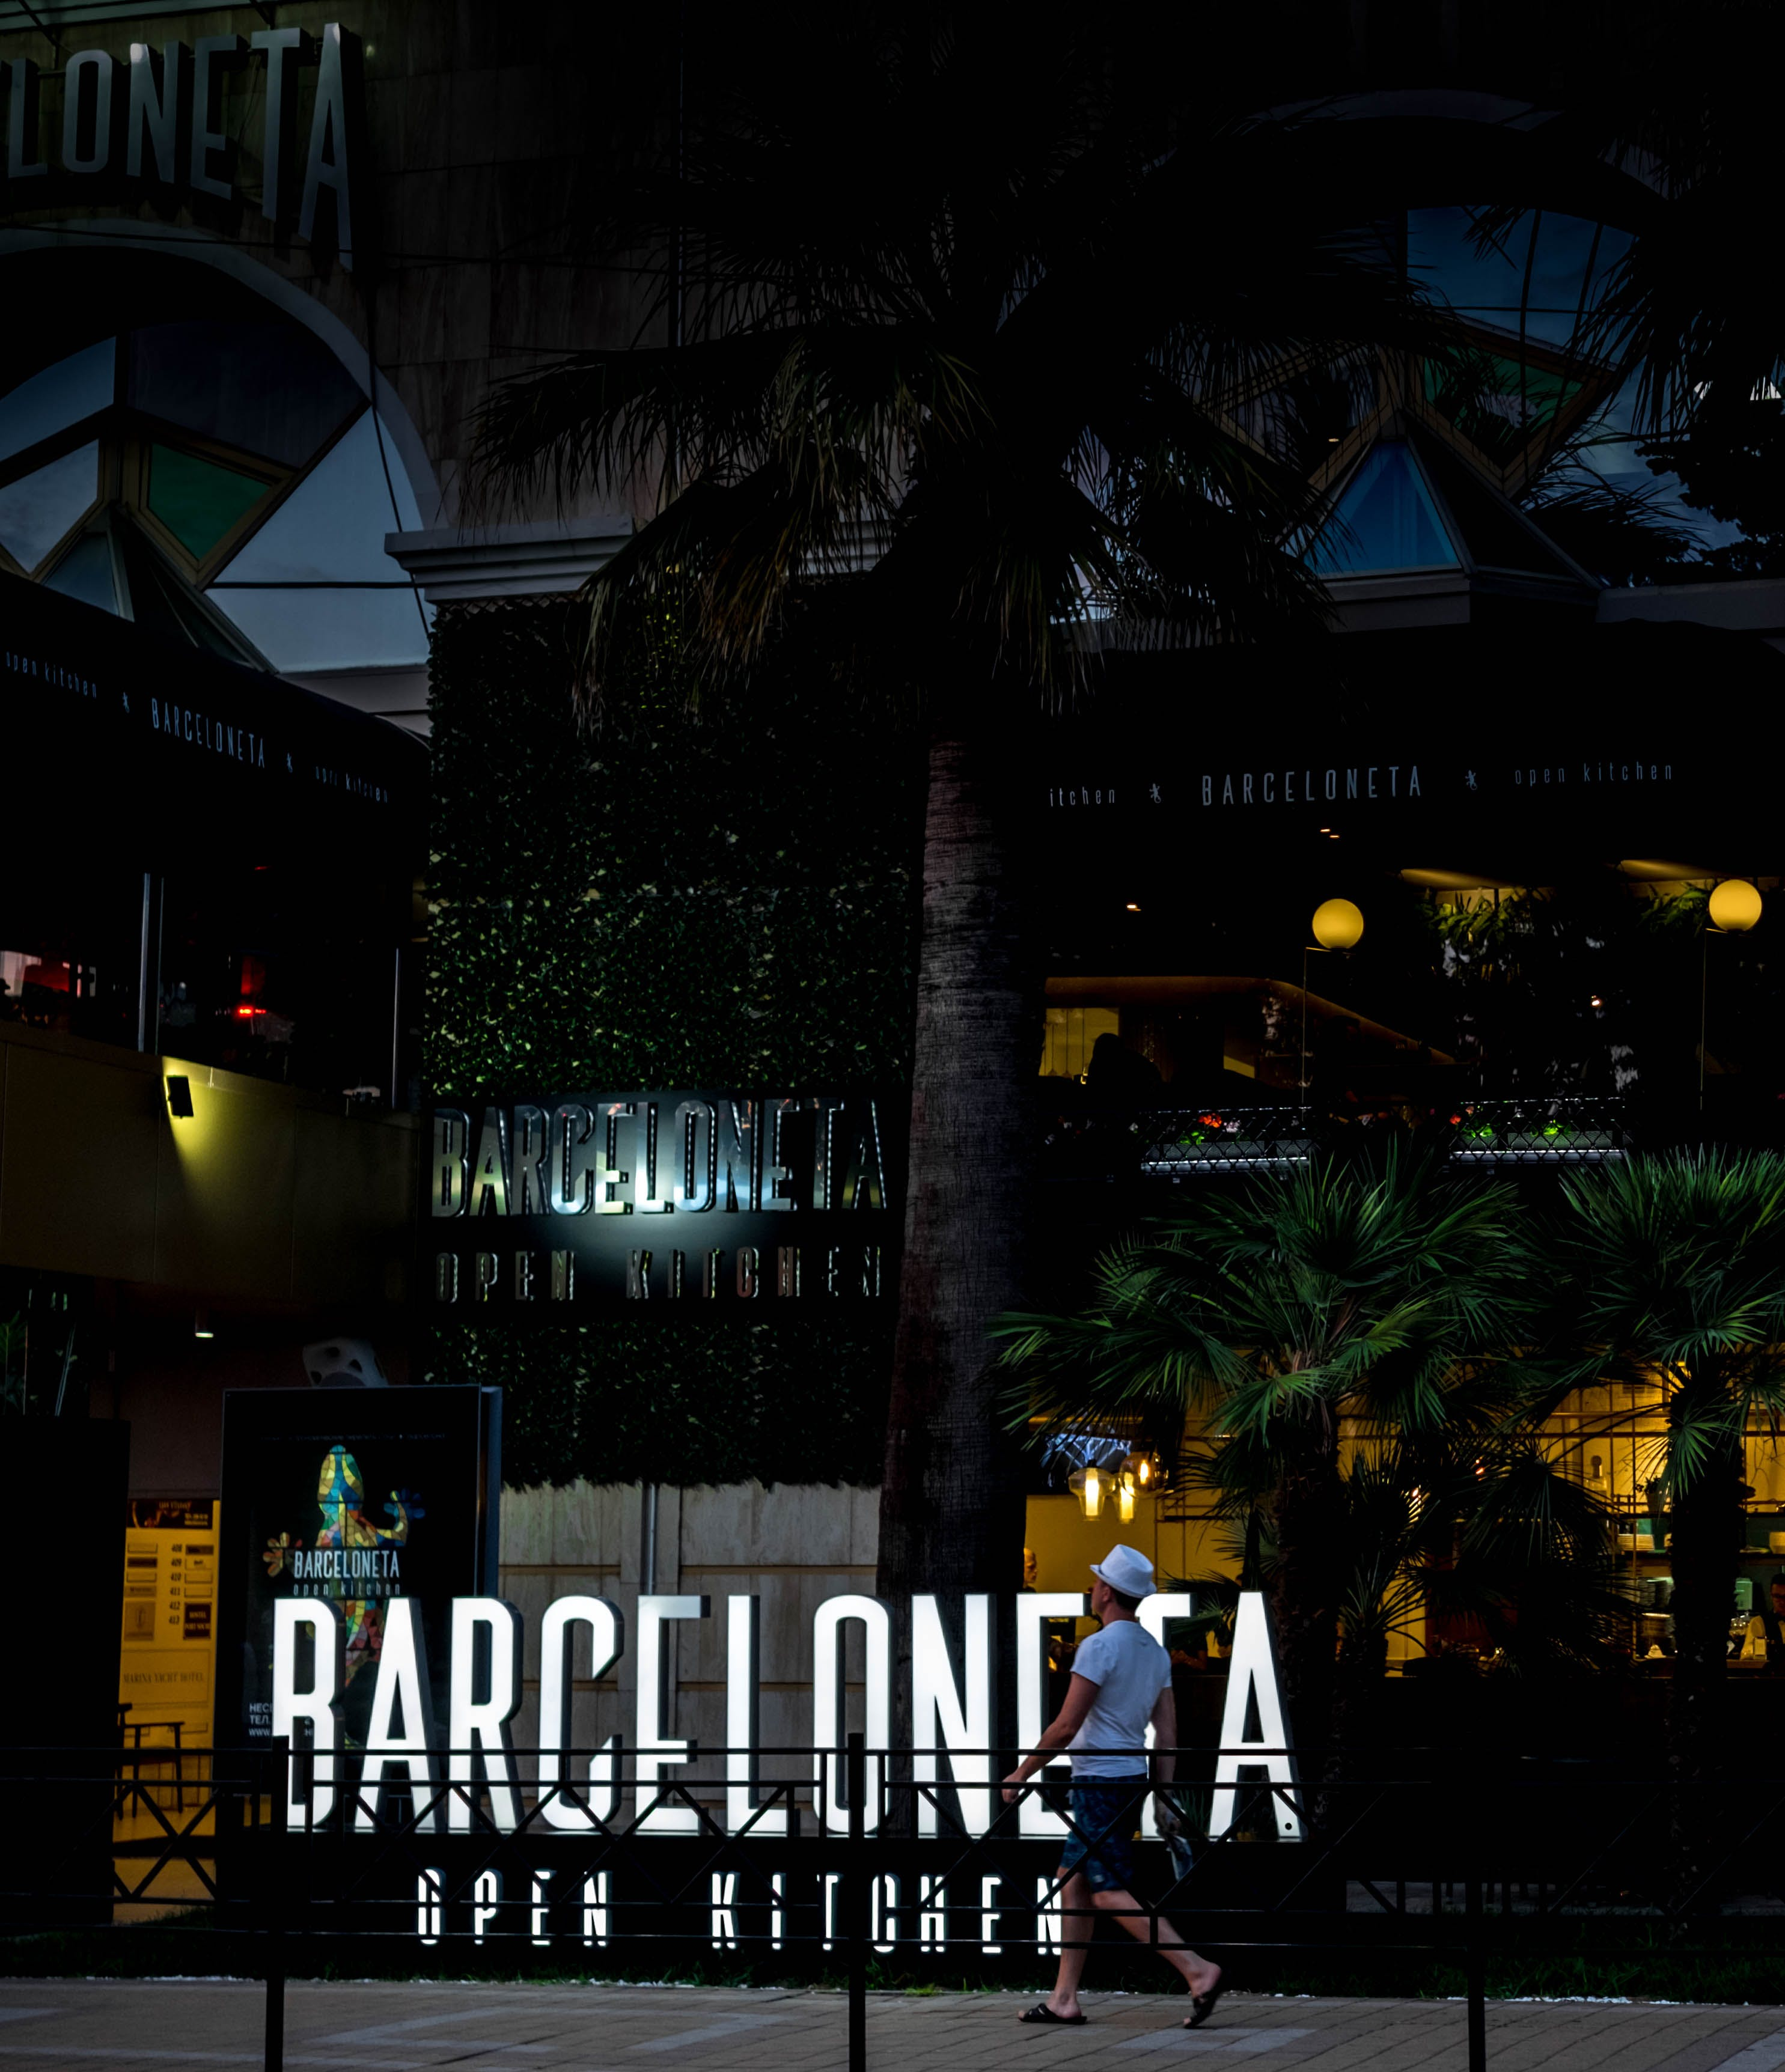 Man Walking in Front of Barceloneta Store